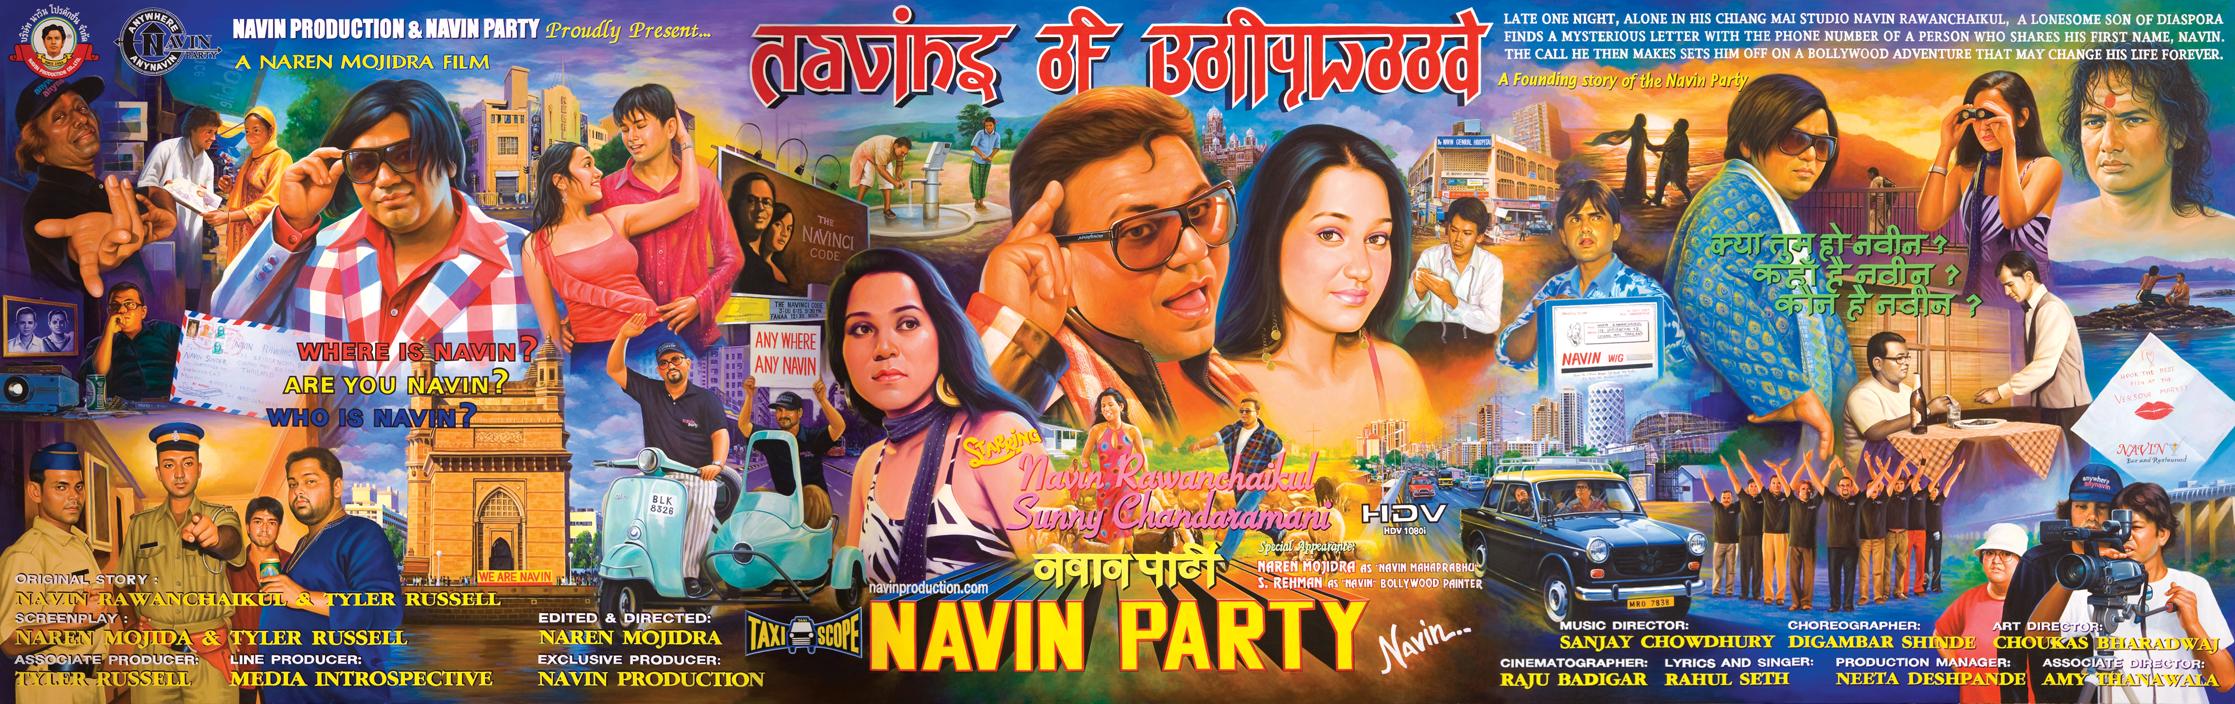 [EXH] No.3_Navins of Bollywood_billboard